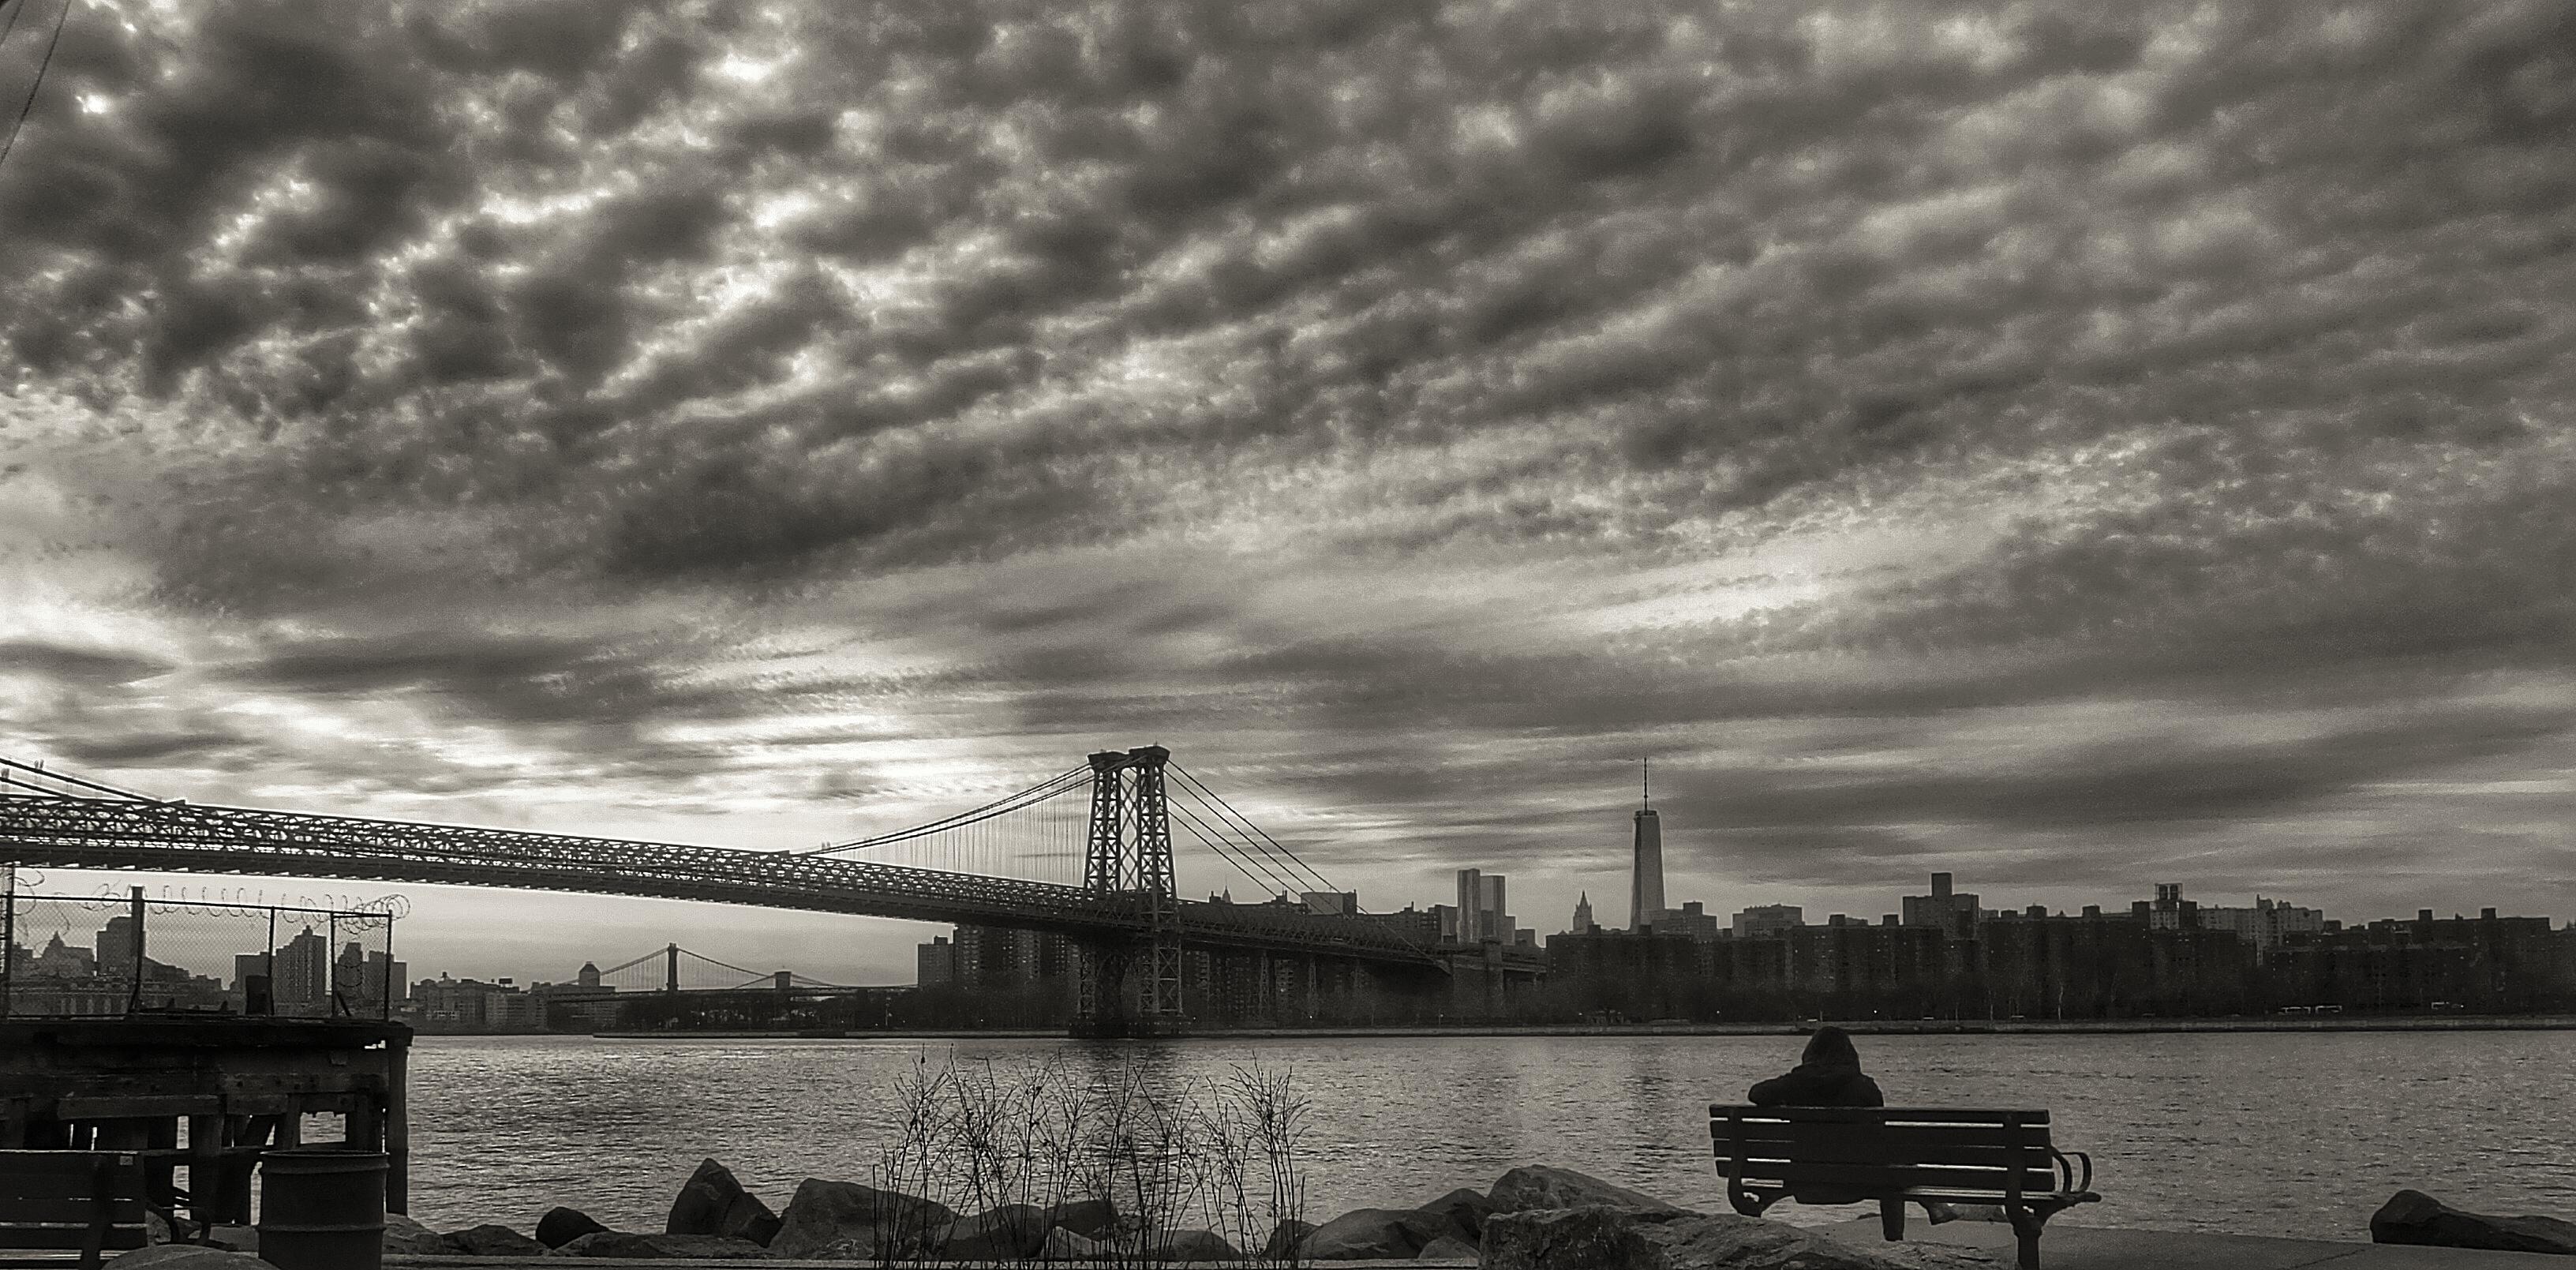 2014-01-24 Canada - Ontario - Toronto - 09 John street - Fotos editadas - 2014 USA New York Brooklyn